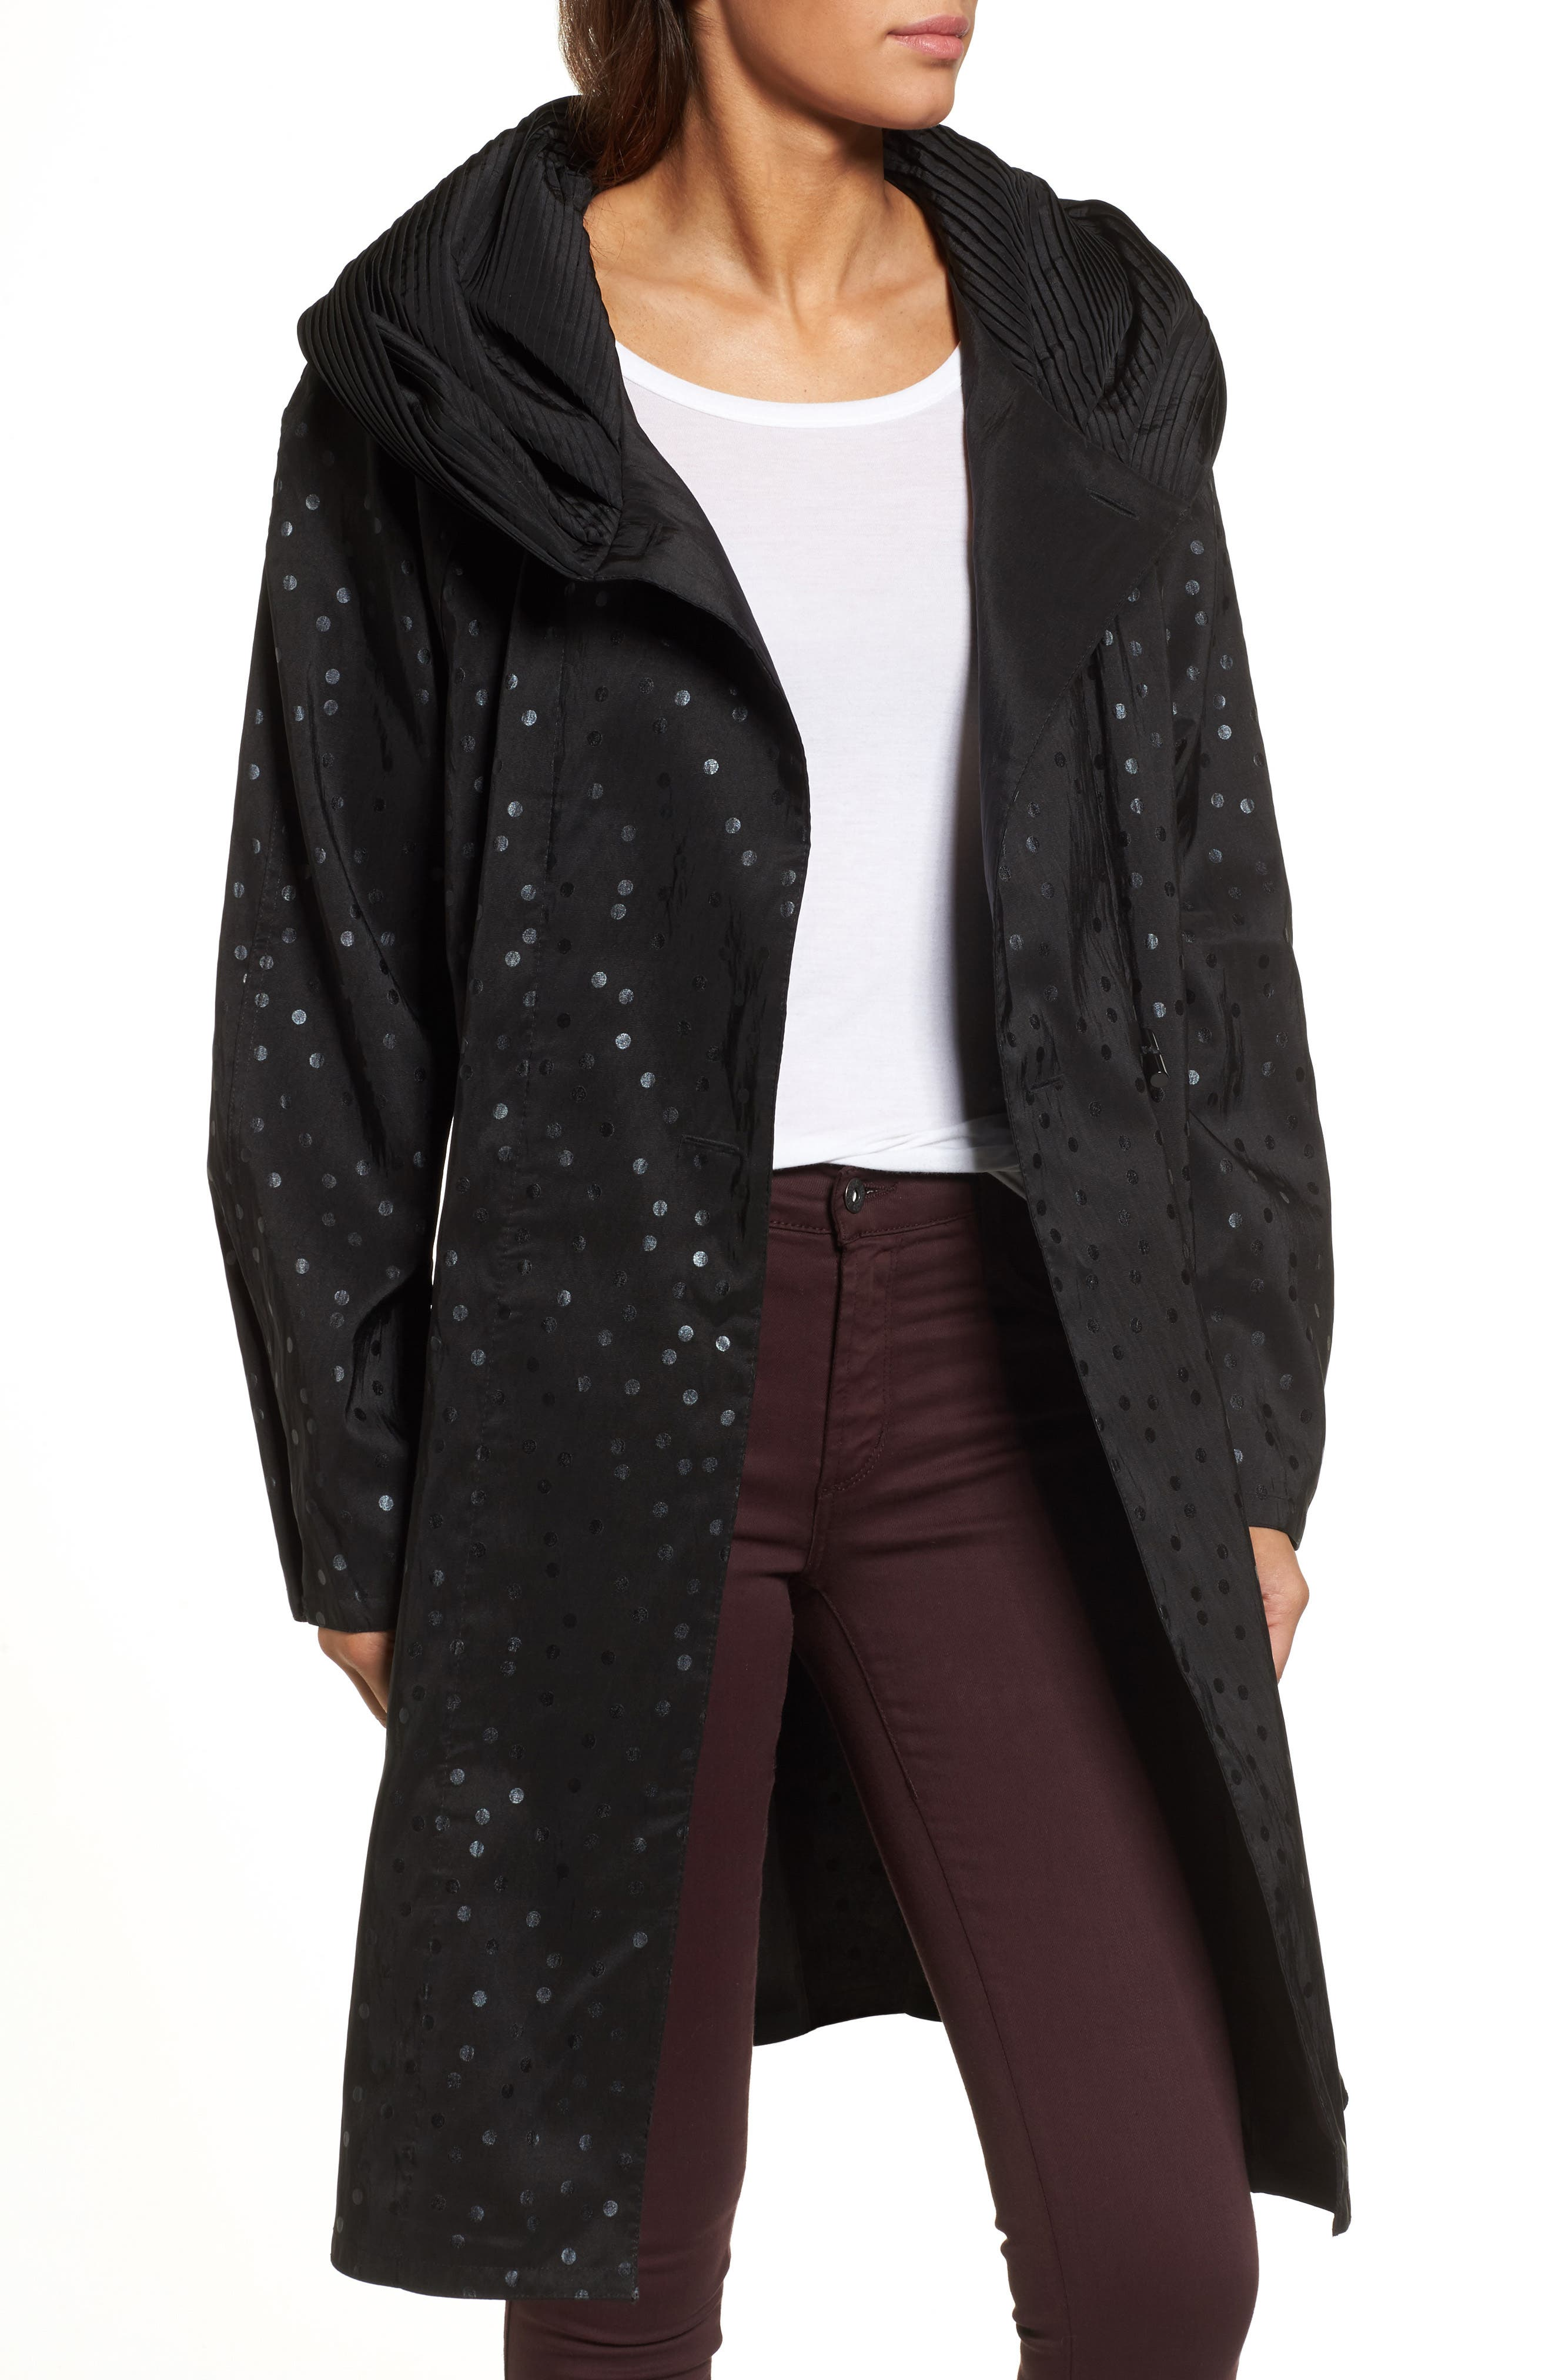 Main Image - Mycra Pac Designer Wear 'Donatella' Reversible Dot Pleat Hood Packable Travel Coat